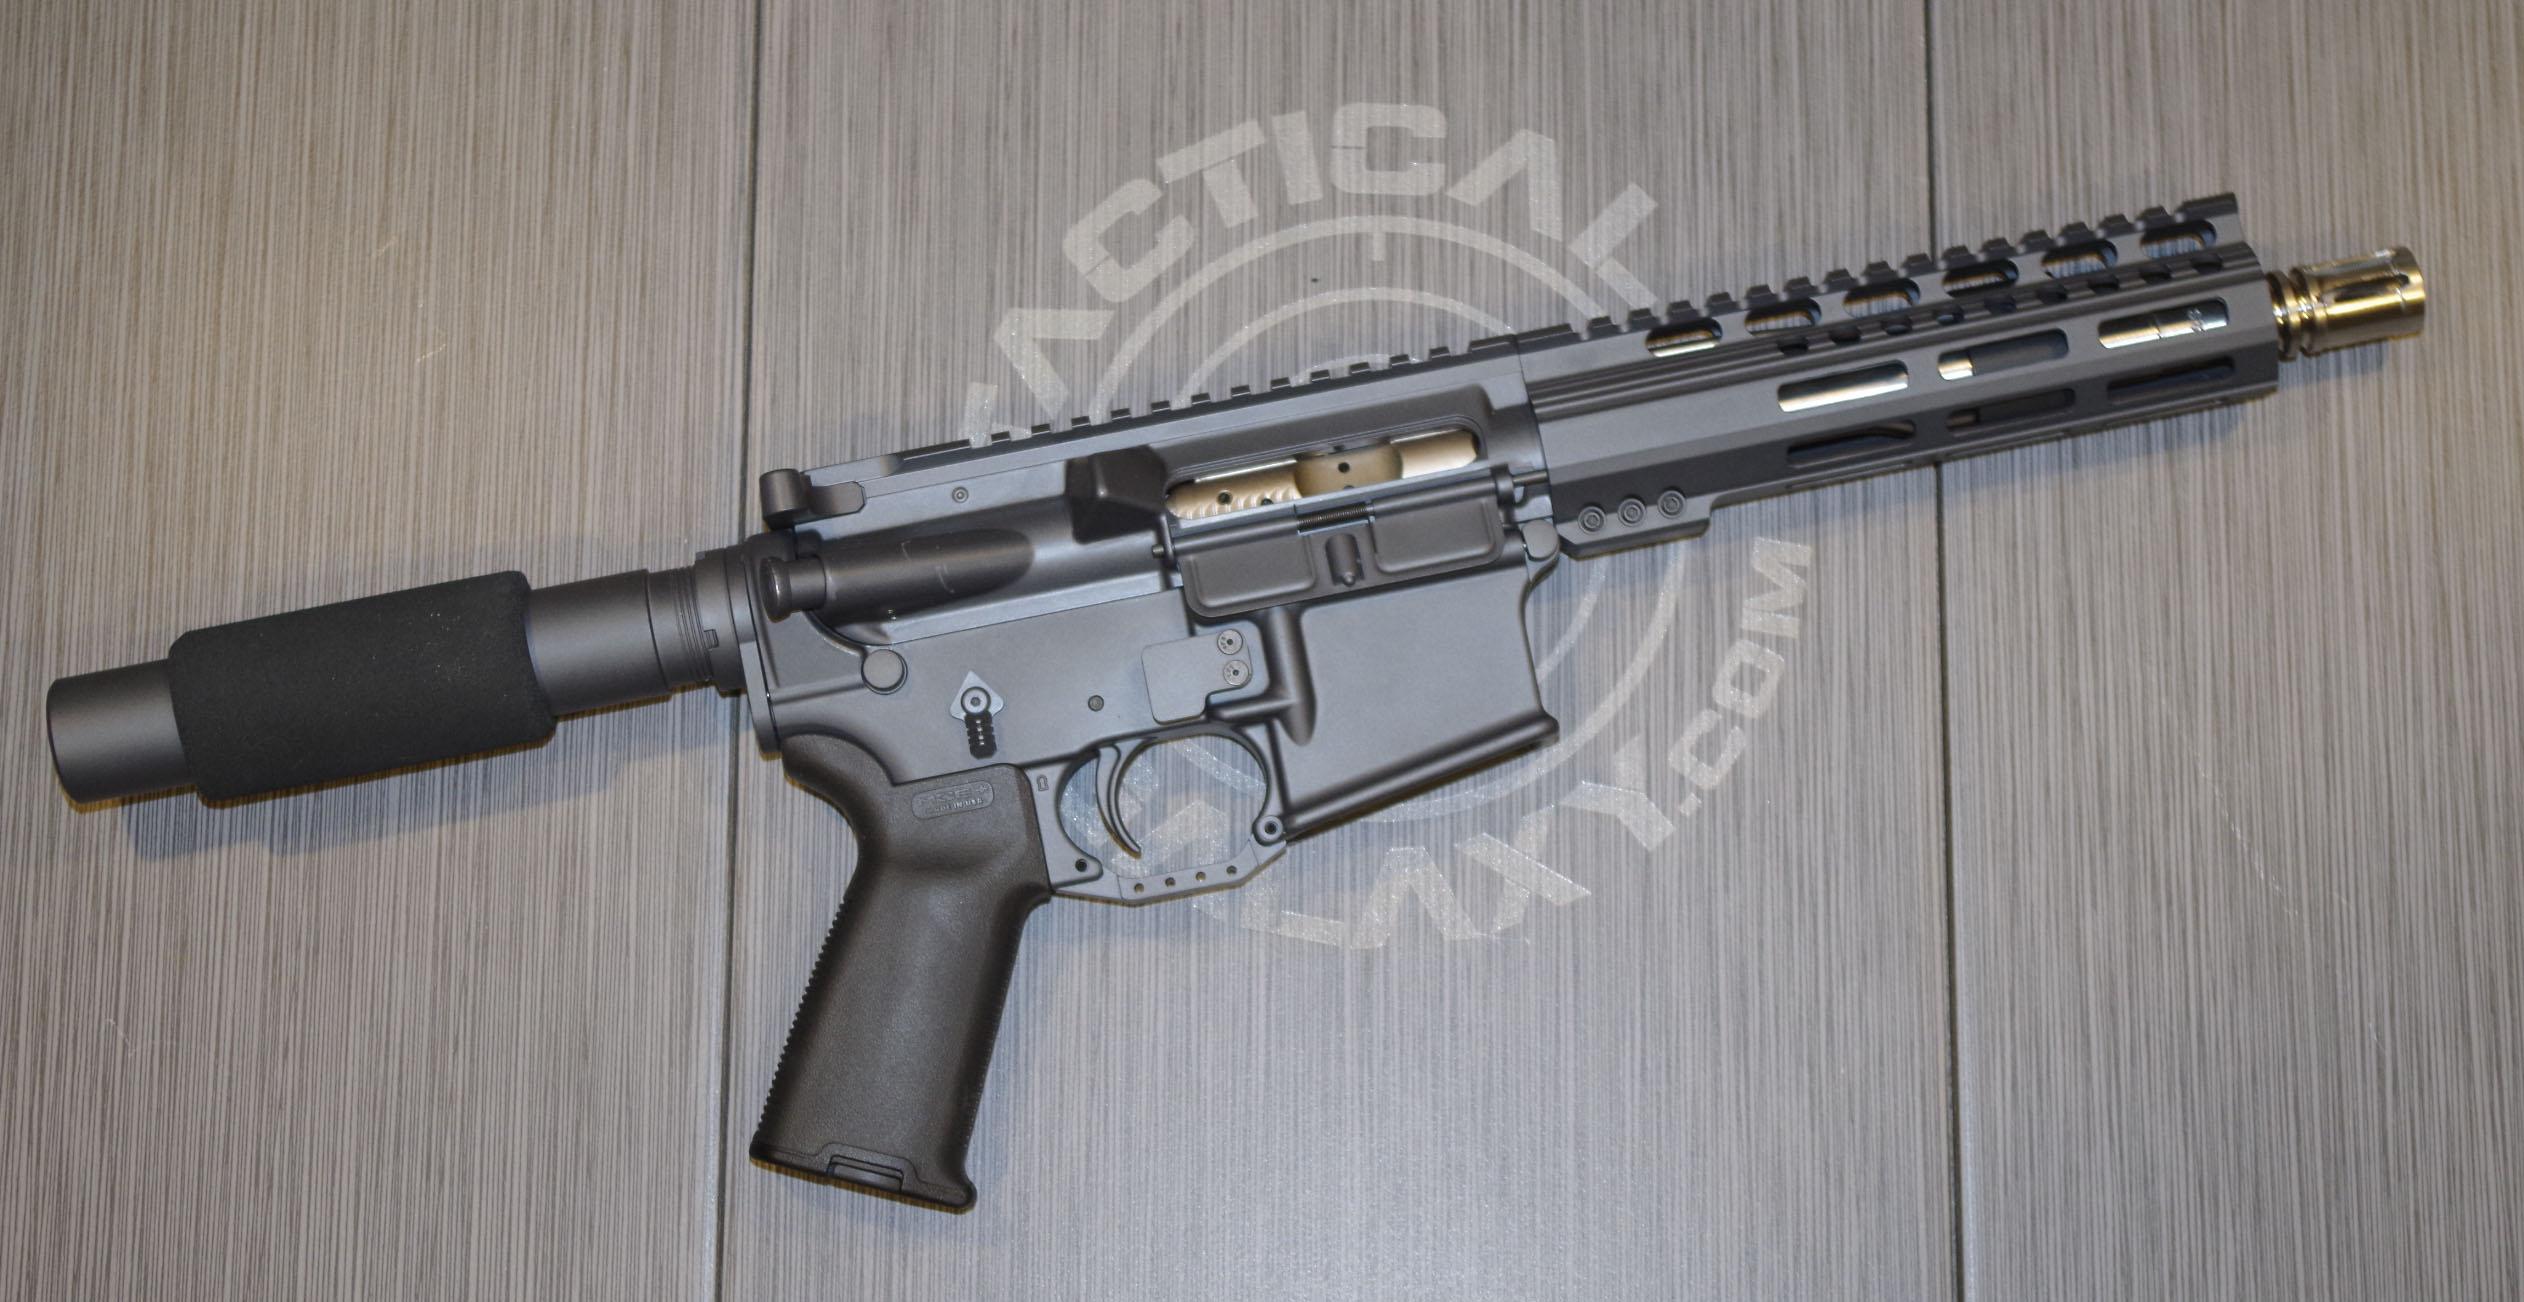 SNIPER GREY CERAKOTE AR-15 PARTS